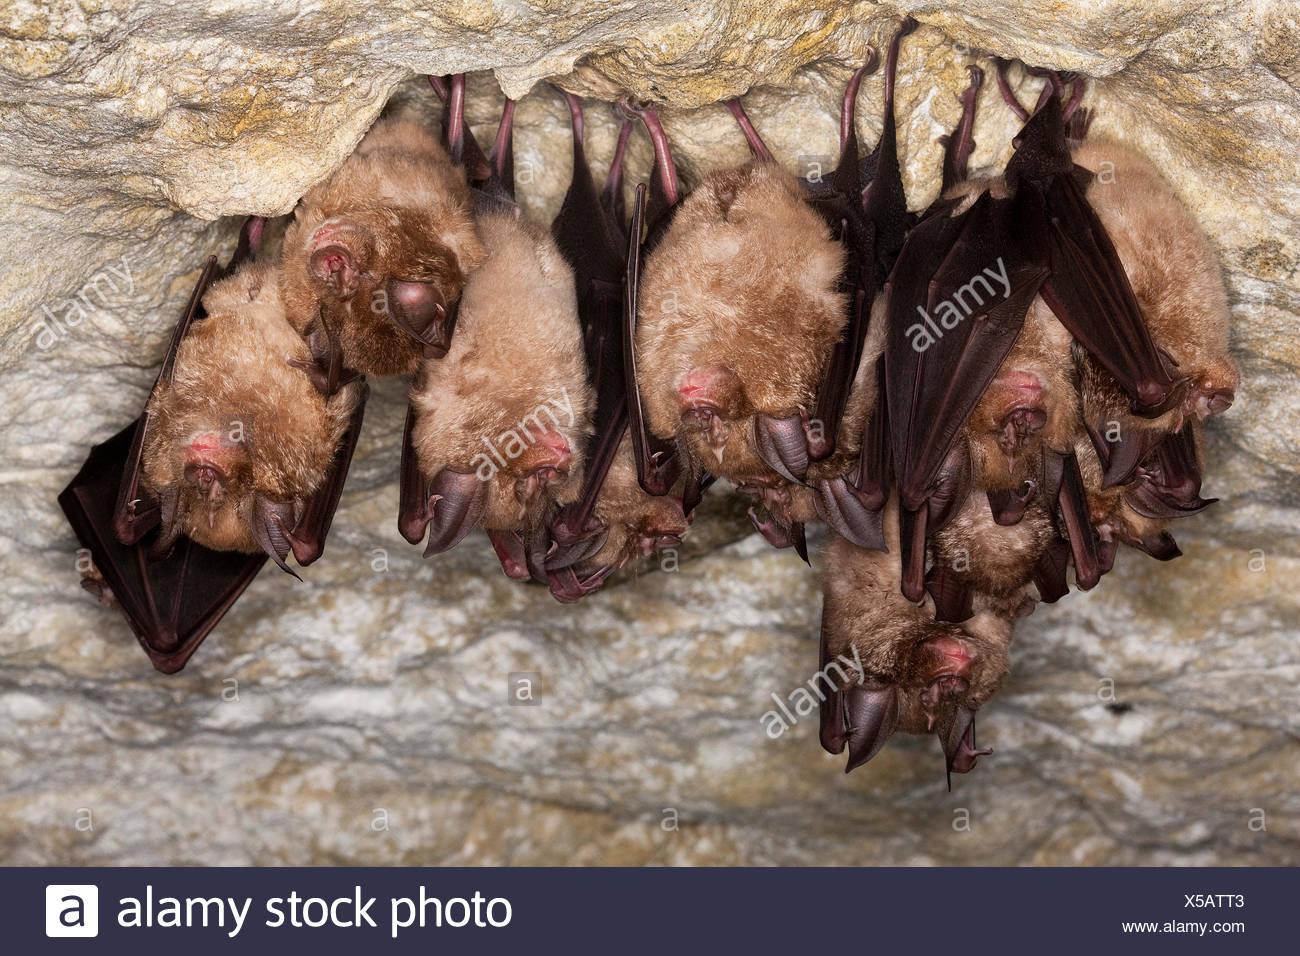 Greater Horsehoe Bat, rhinolophus ferrumequinum, Colony Hibernating in a Cave, Normandy - Stock Image